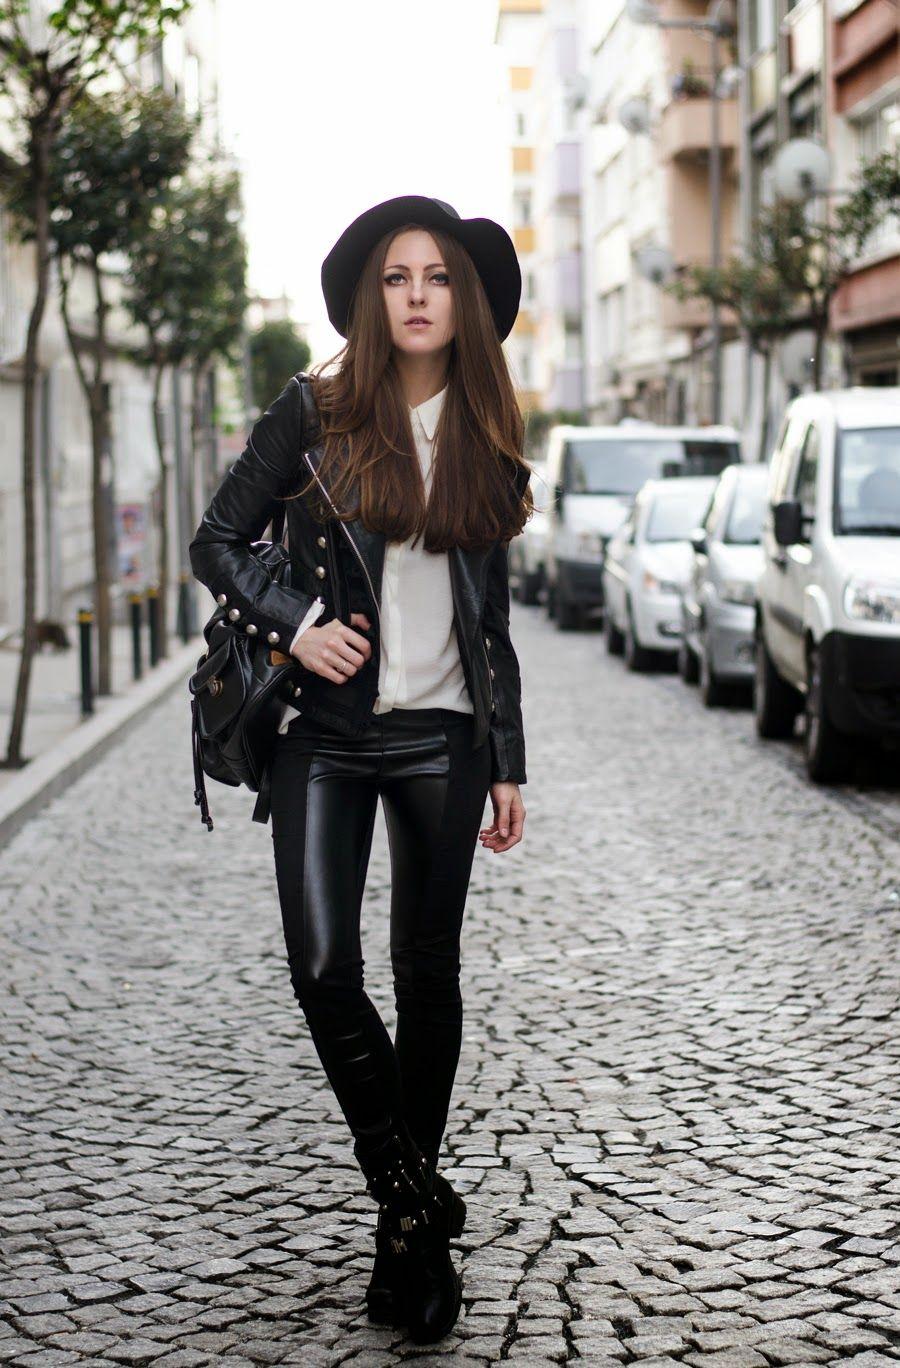 Katerina Kraynova: Glam Rock Fashion Style | Fashion ...